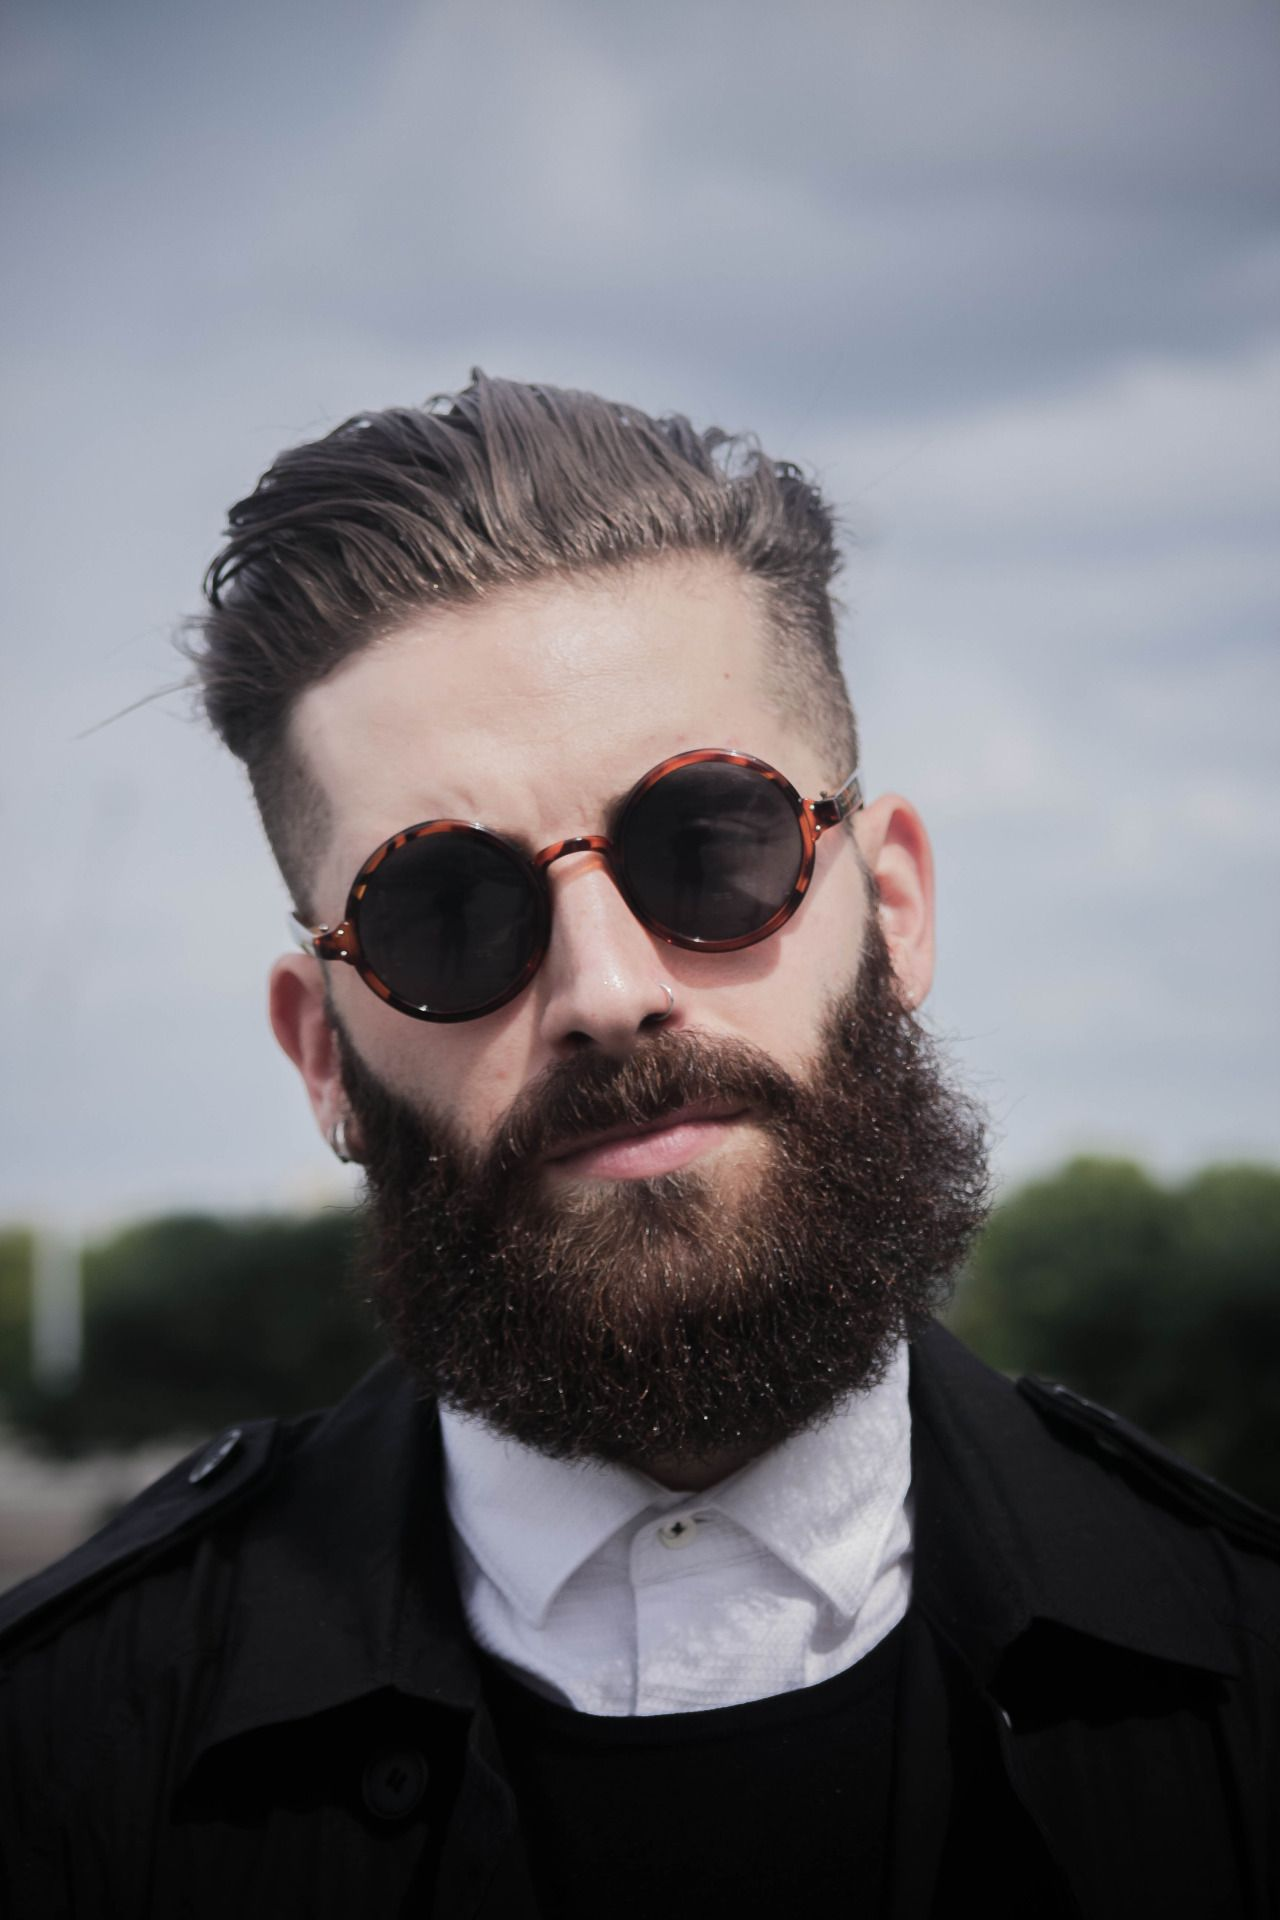 4409f0a6e7c8 Great Hair & Beard with #dapper round men's sunglasses | Fabulous ...